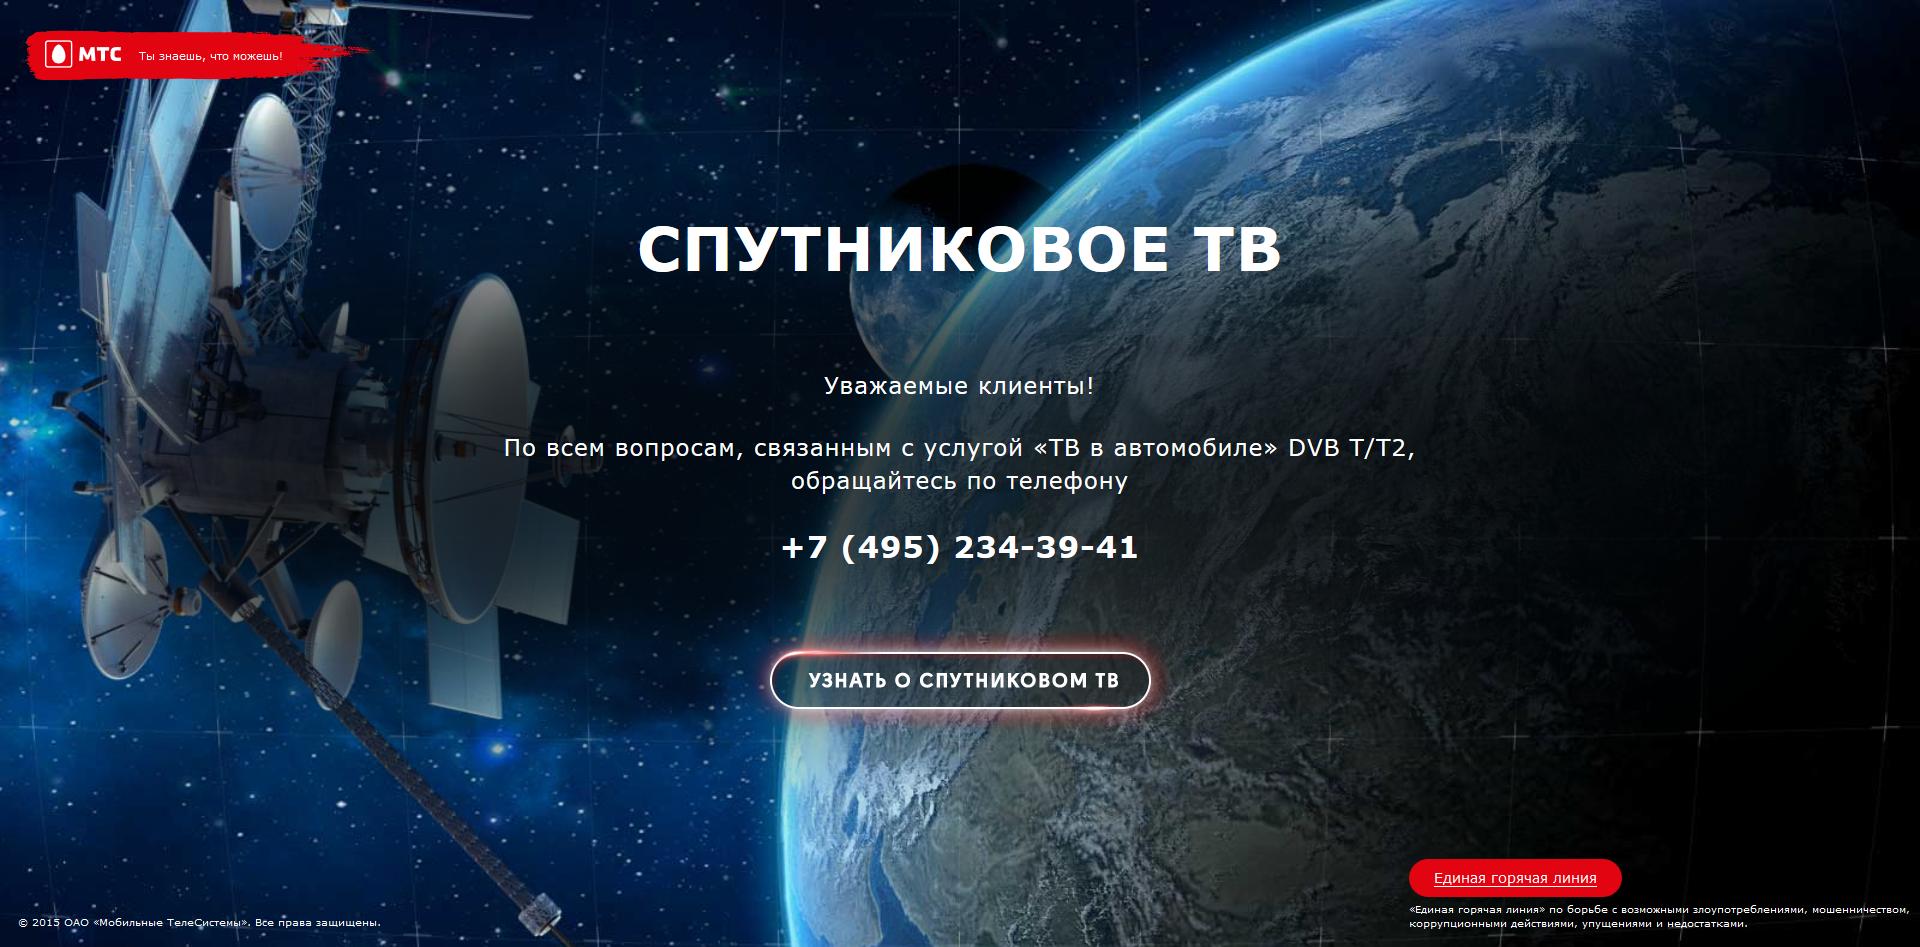 www-dtb-ru_2016-09-15_12-42-39